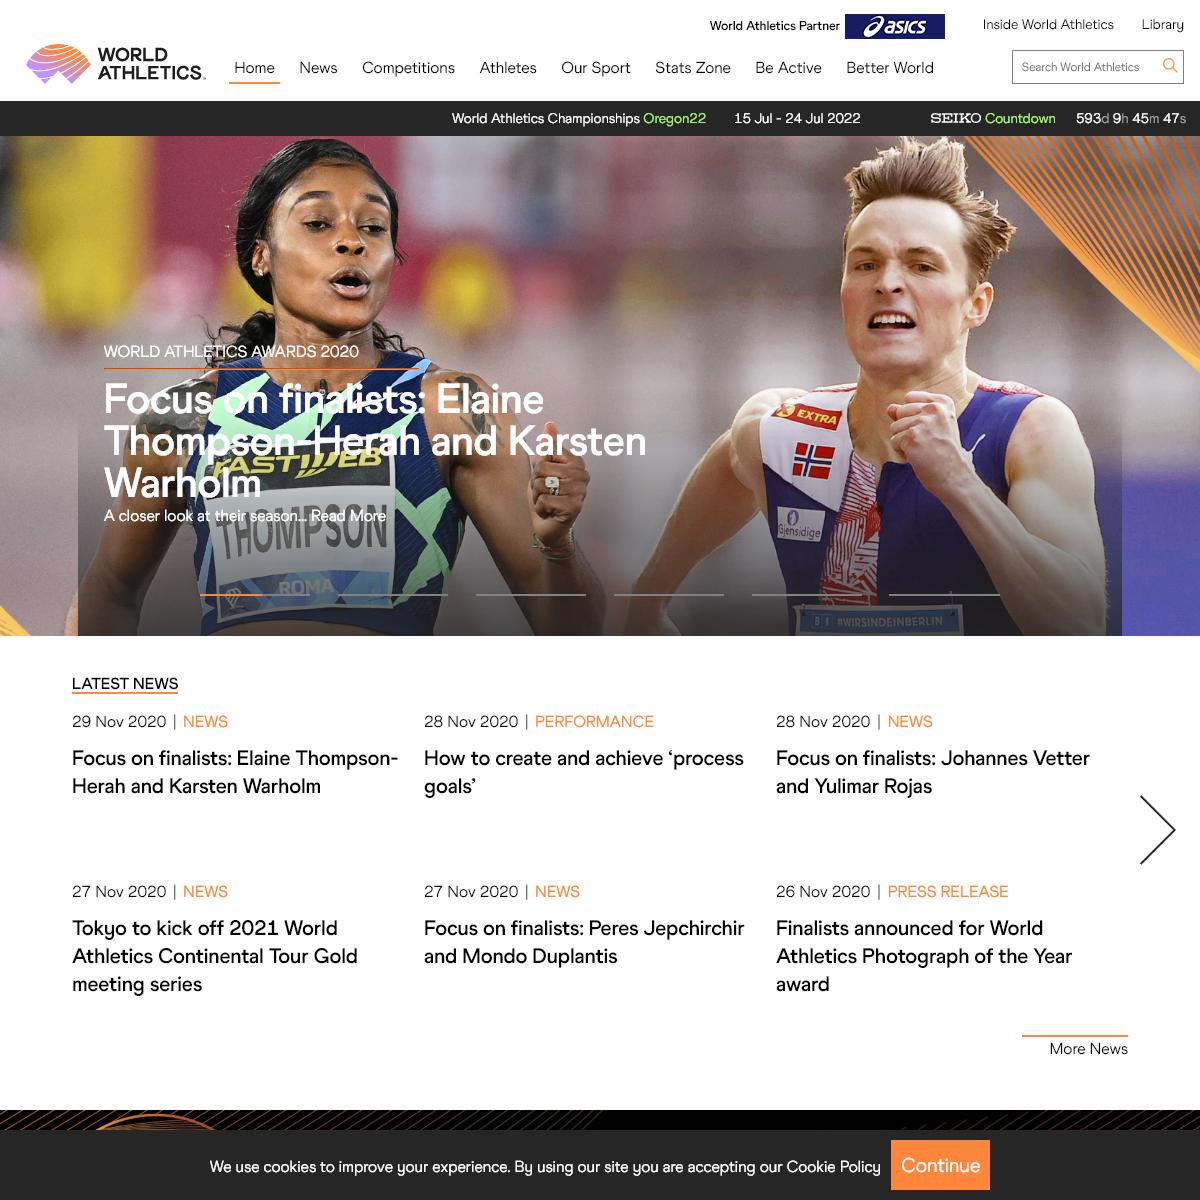 World Athletics Home Page